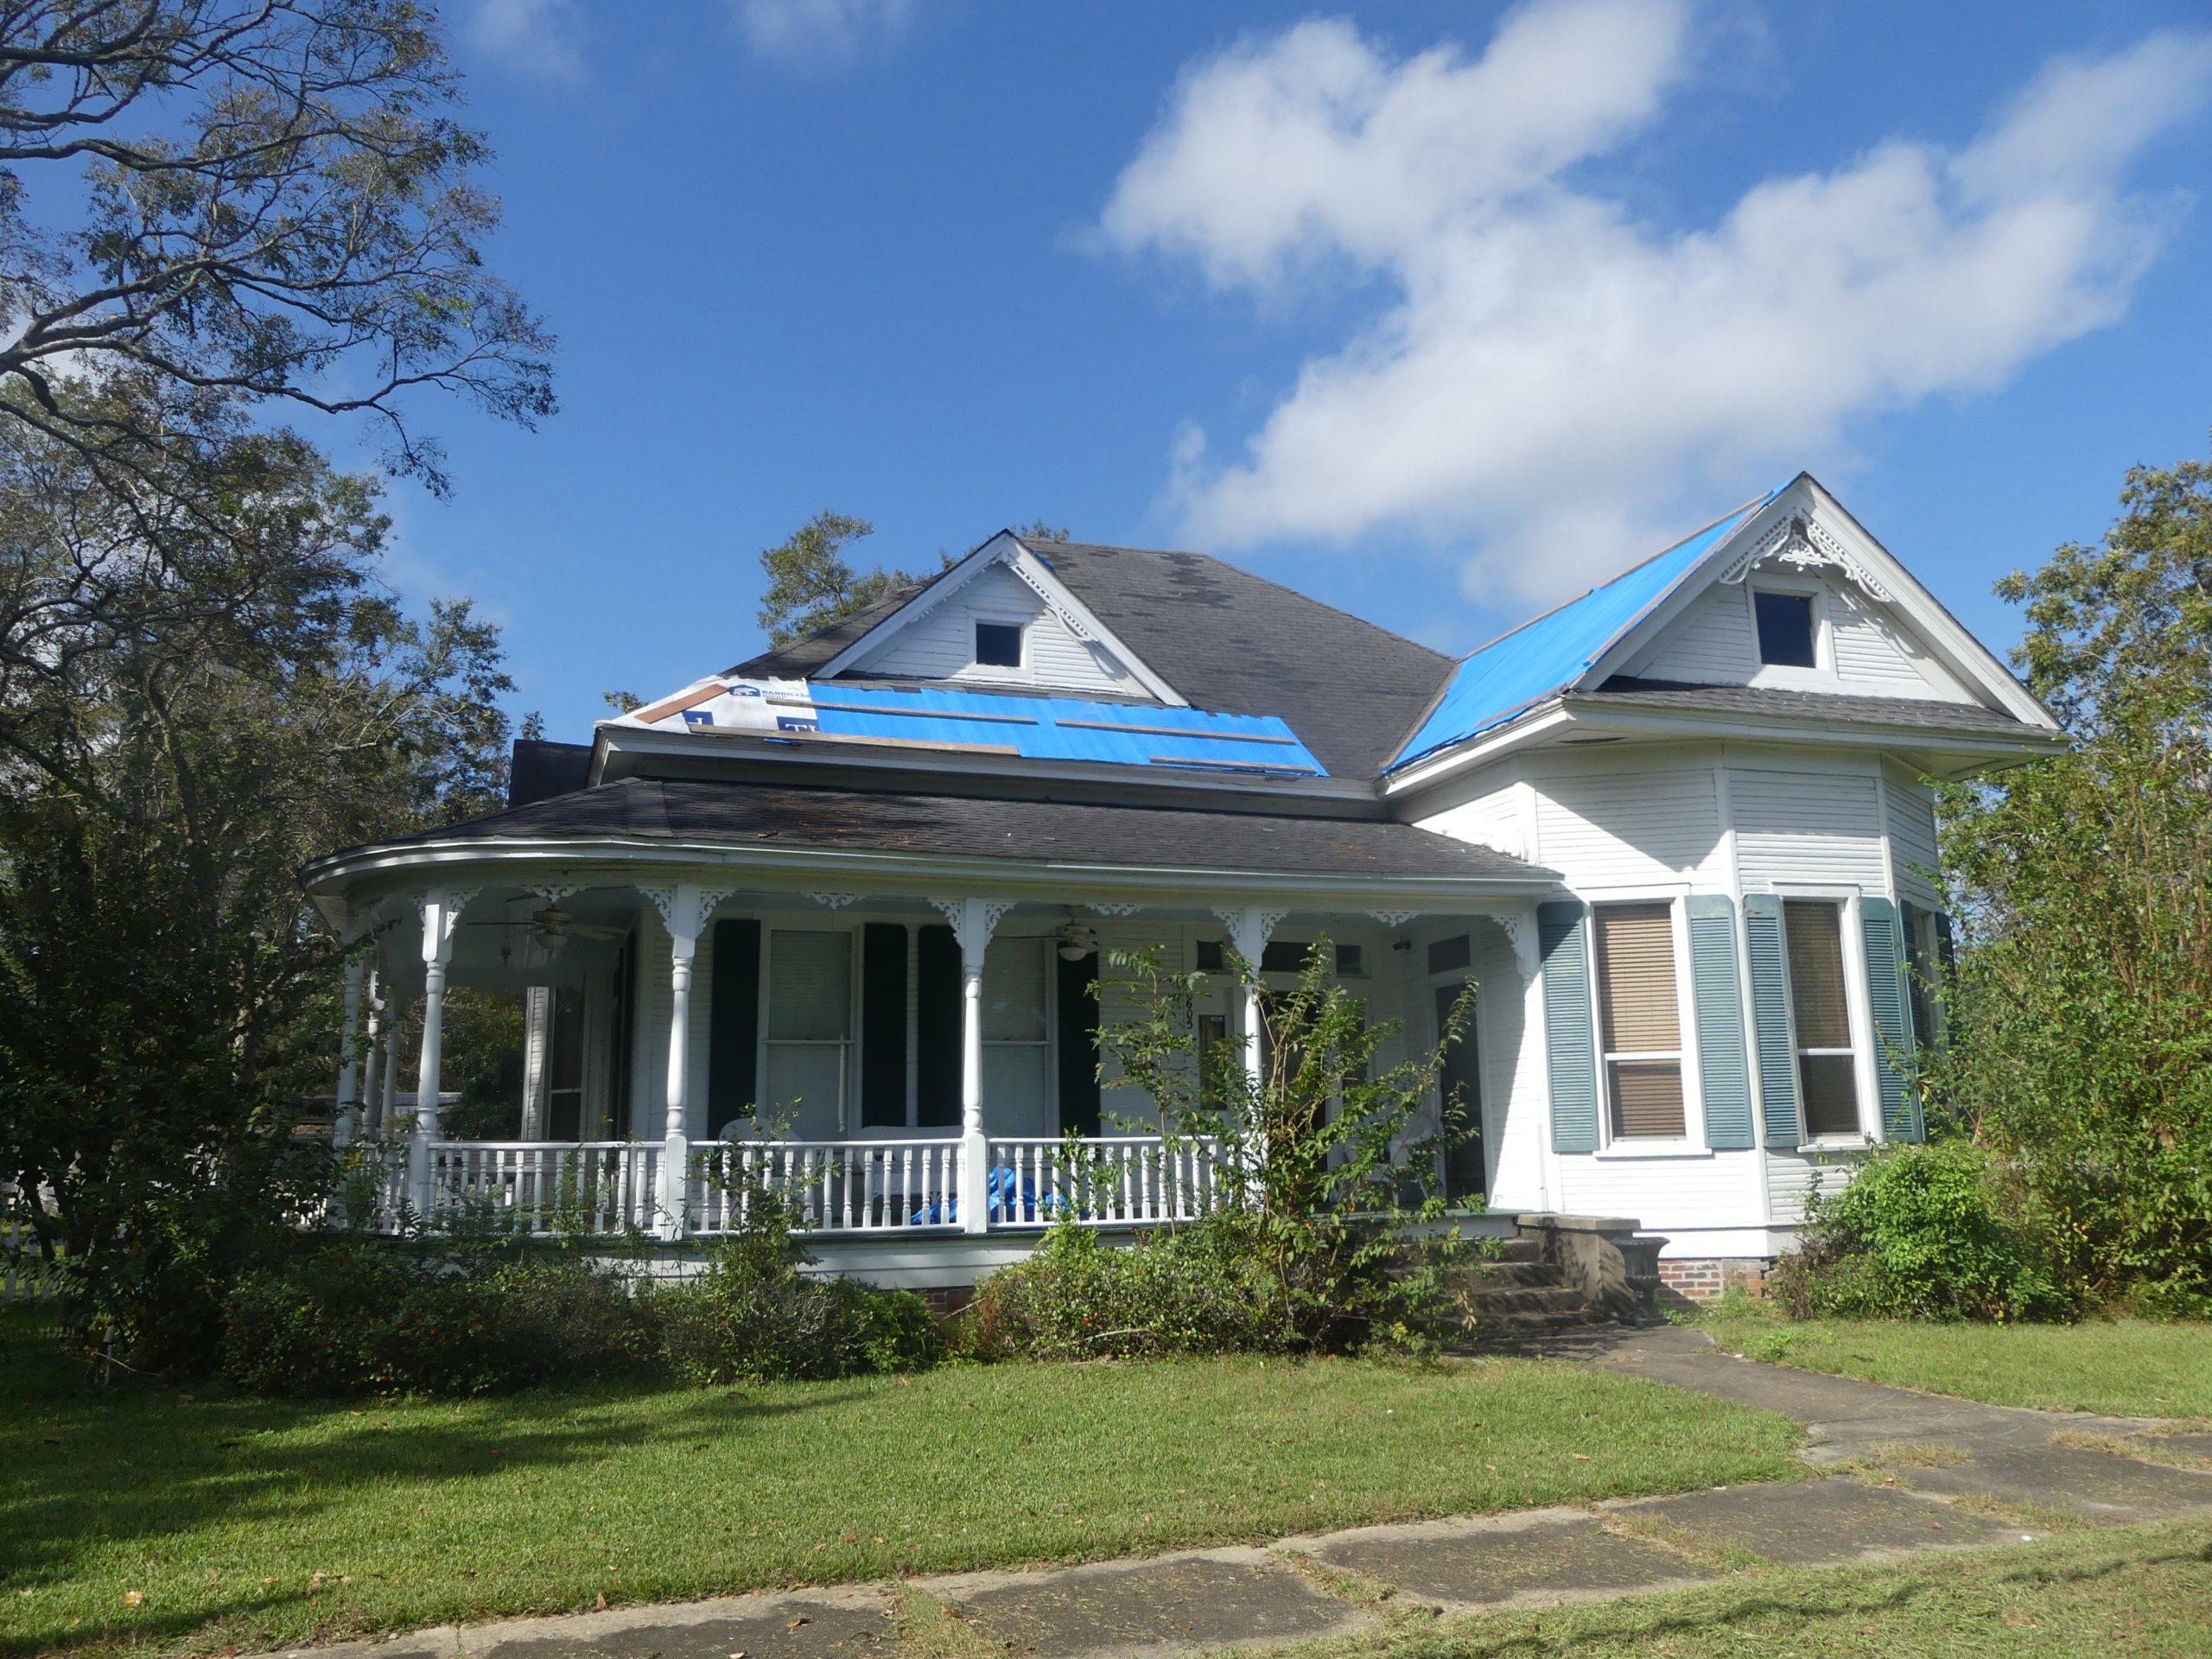 blue tarps over shingles